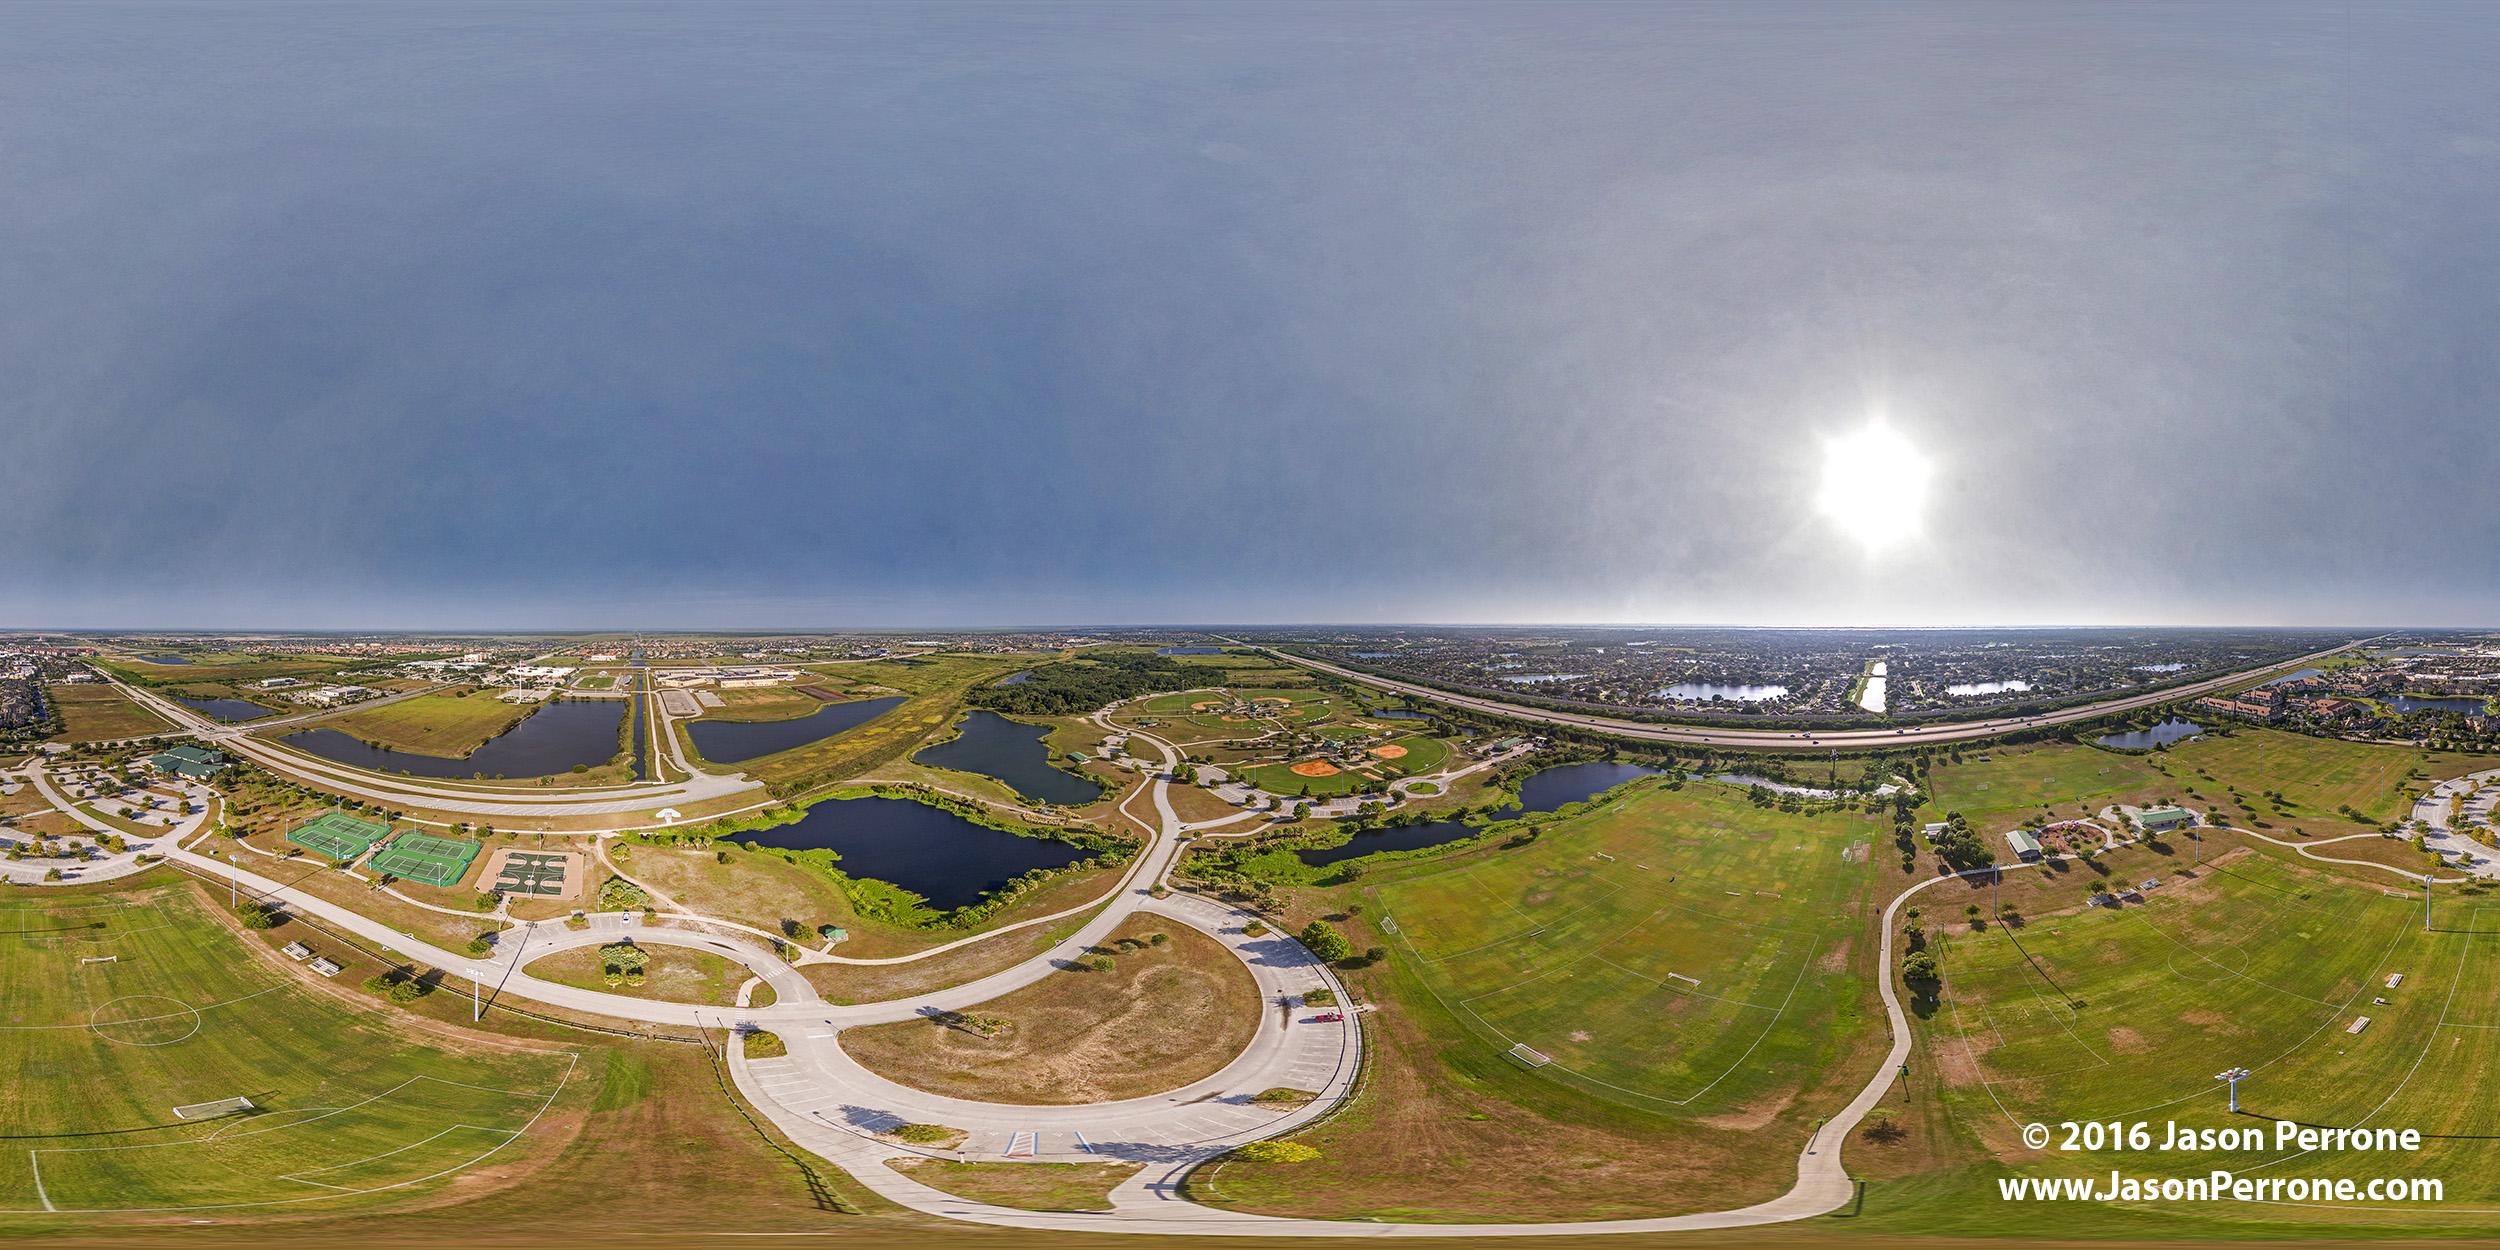 Viera Regional Park Aerial 360